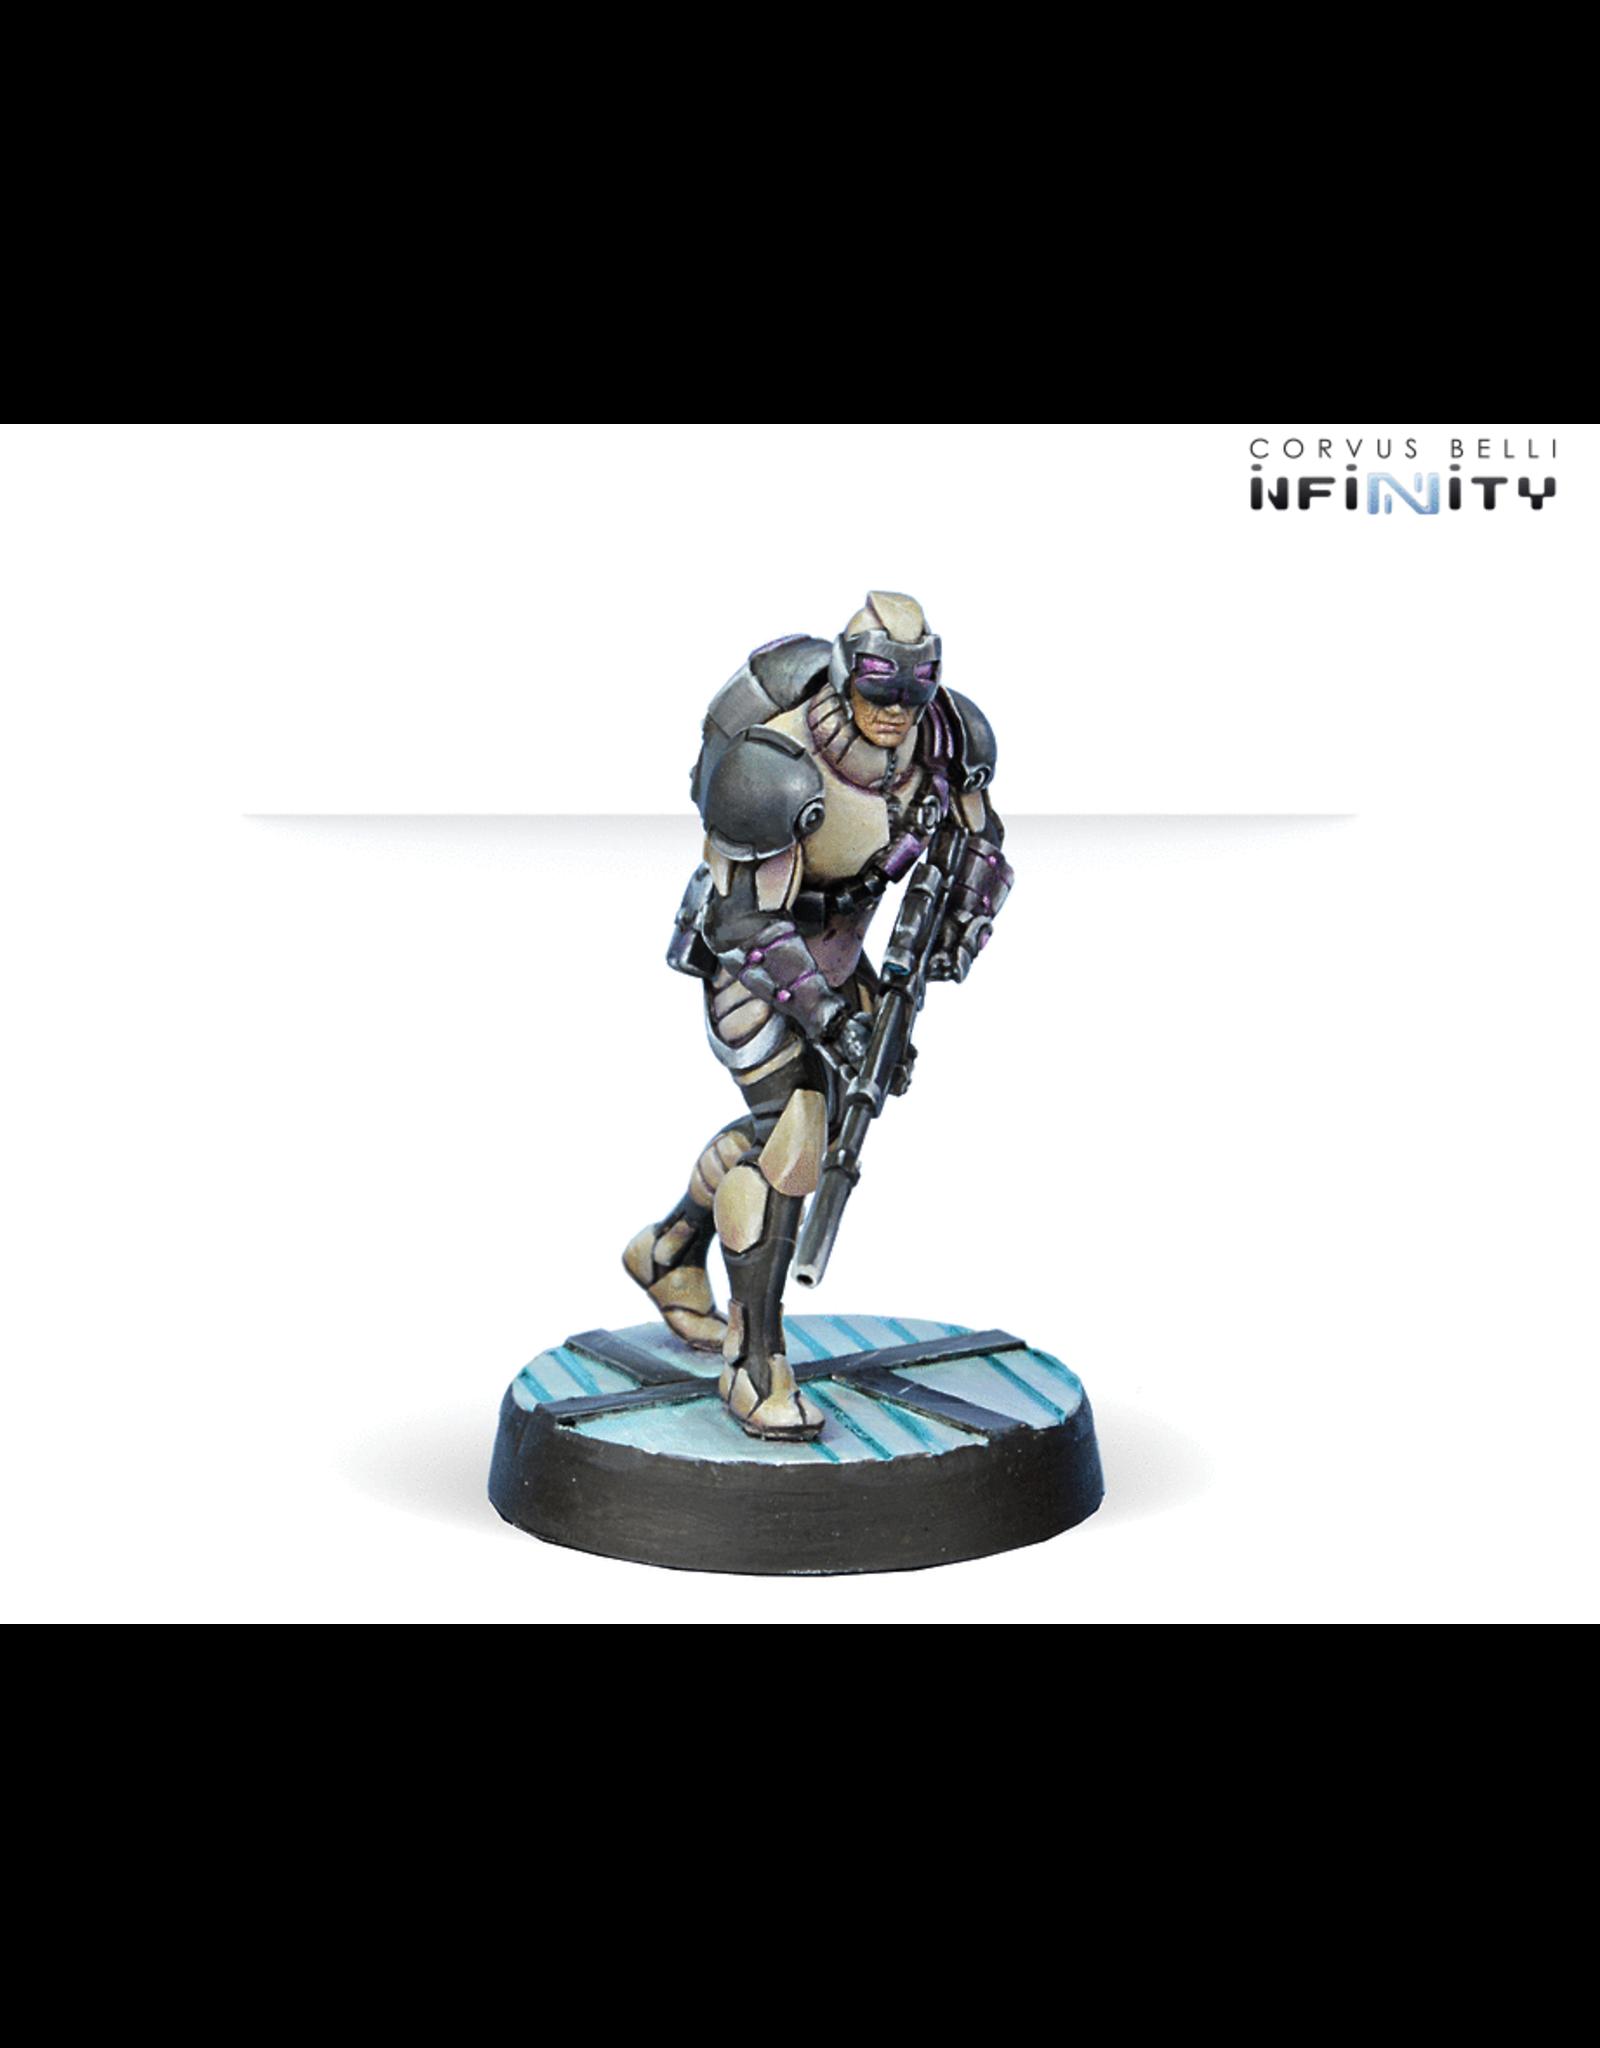 Corvus Belli Infinity: Agema Marksman